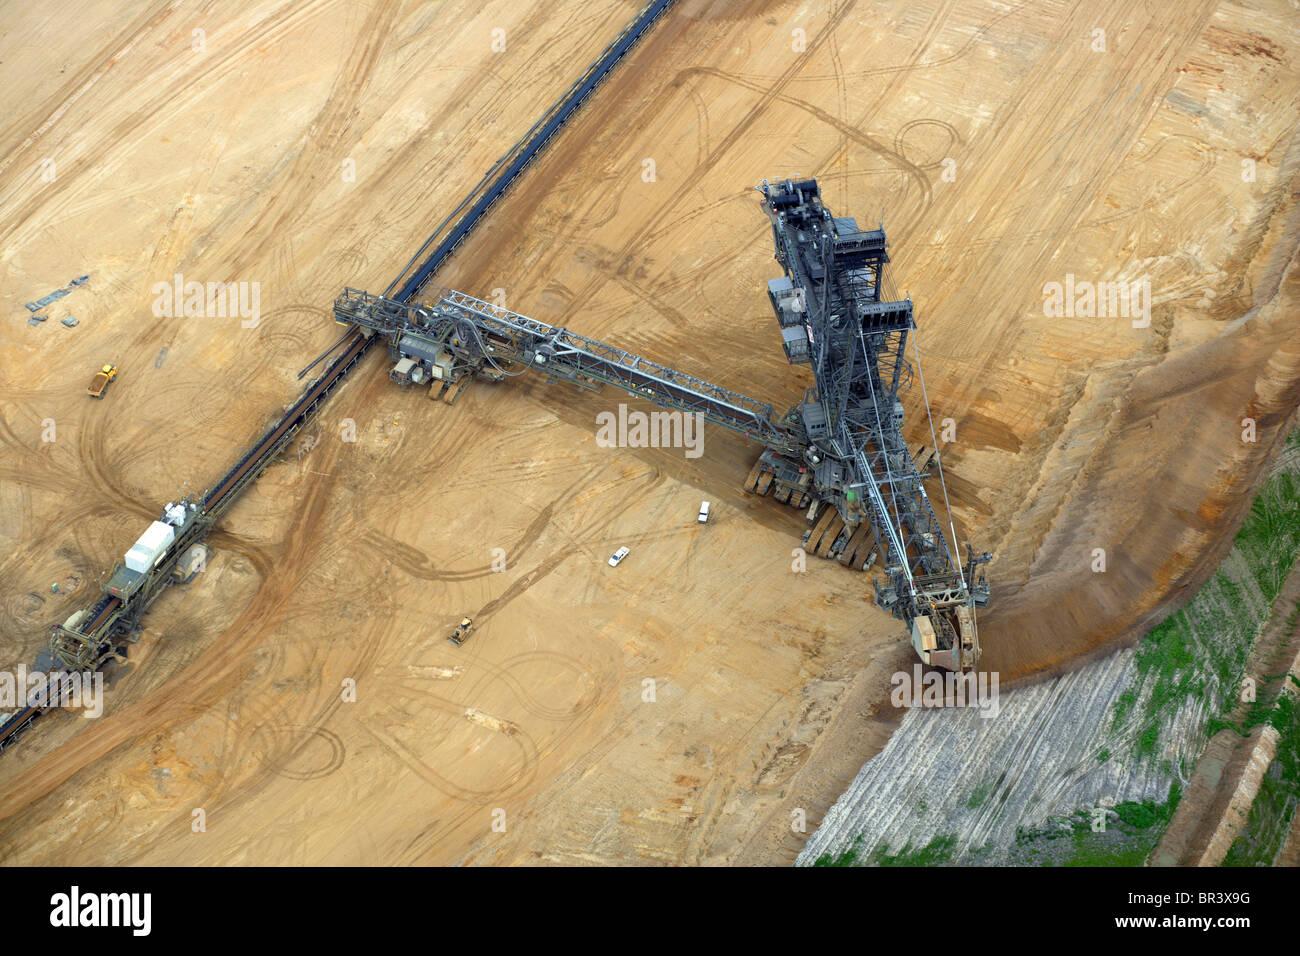 bucket-wheel excavator at brown coal surface mining, Germany, North Rhine-Westphalia, Hambach - Stock Image